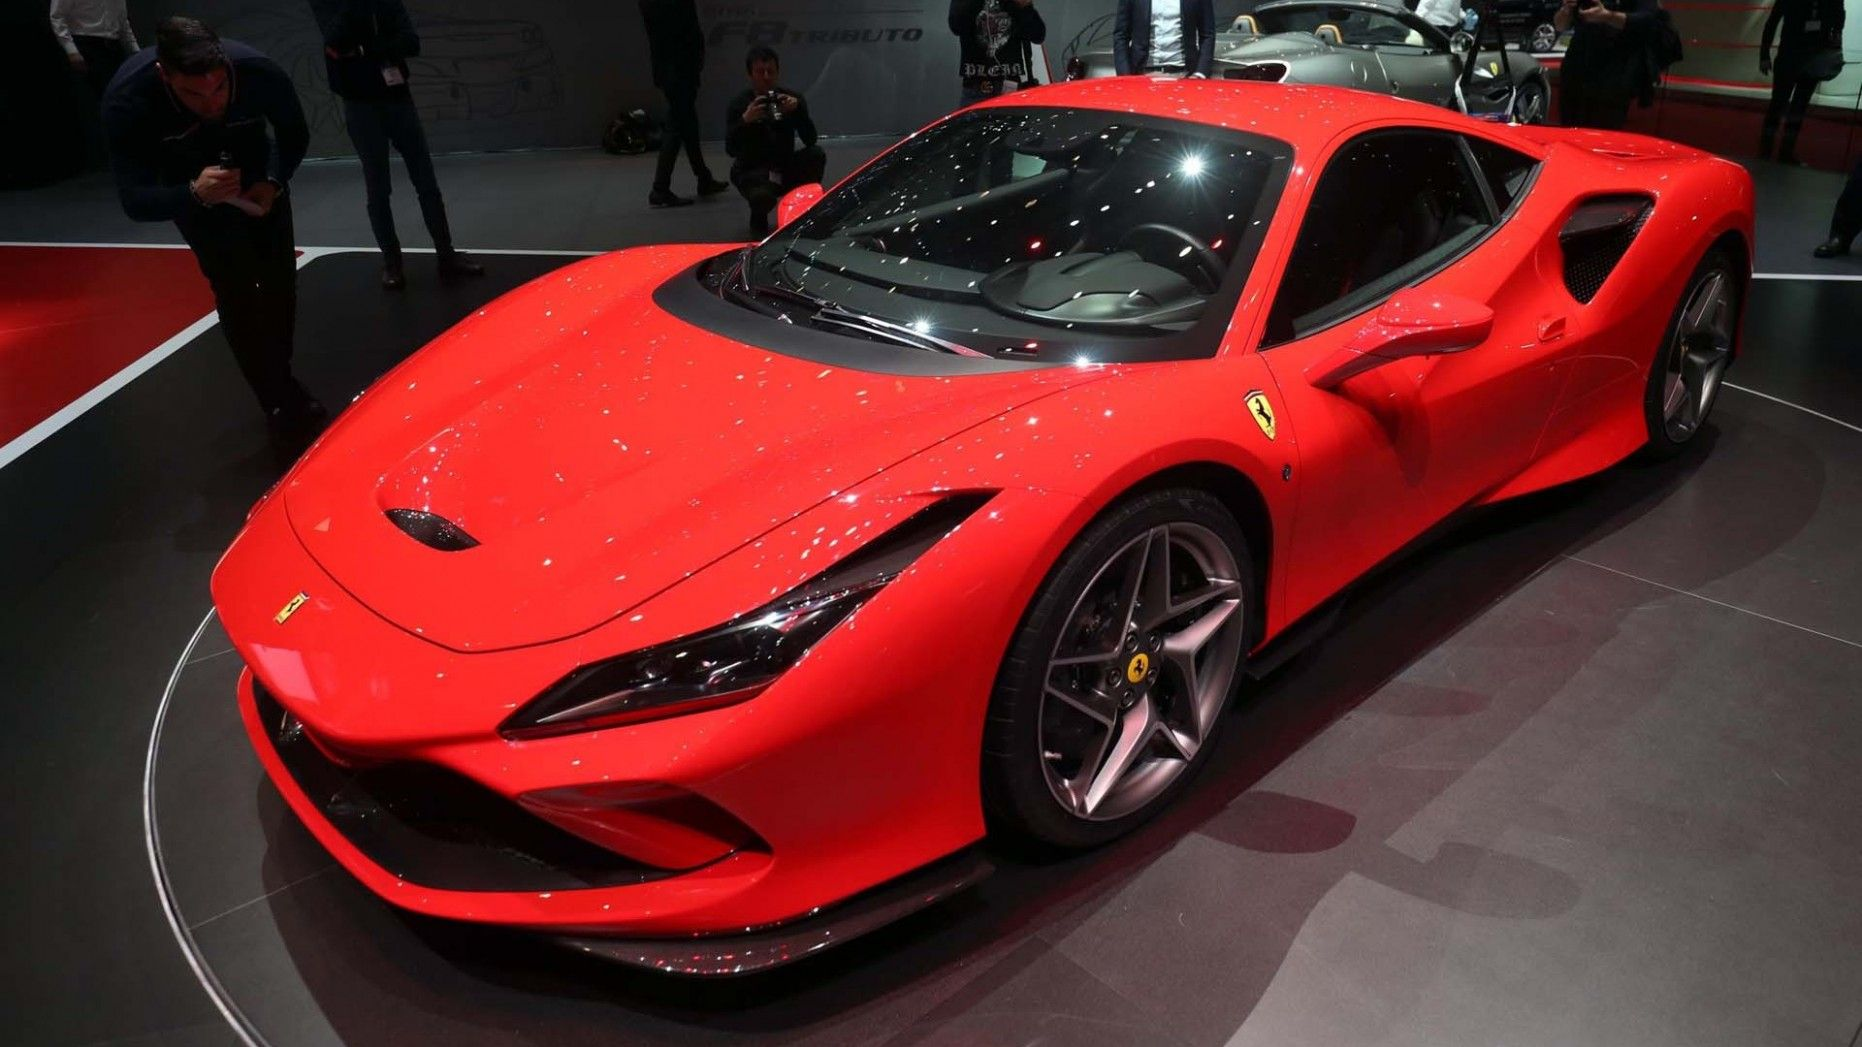 2020 Ferrari 488 Gtb Price Design And Review Ferrari Price Ferrari 458 Ferrari